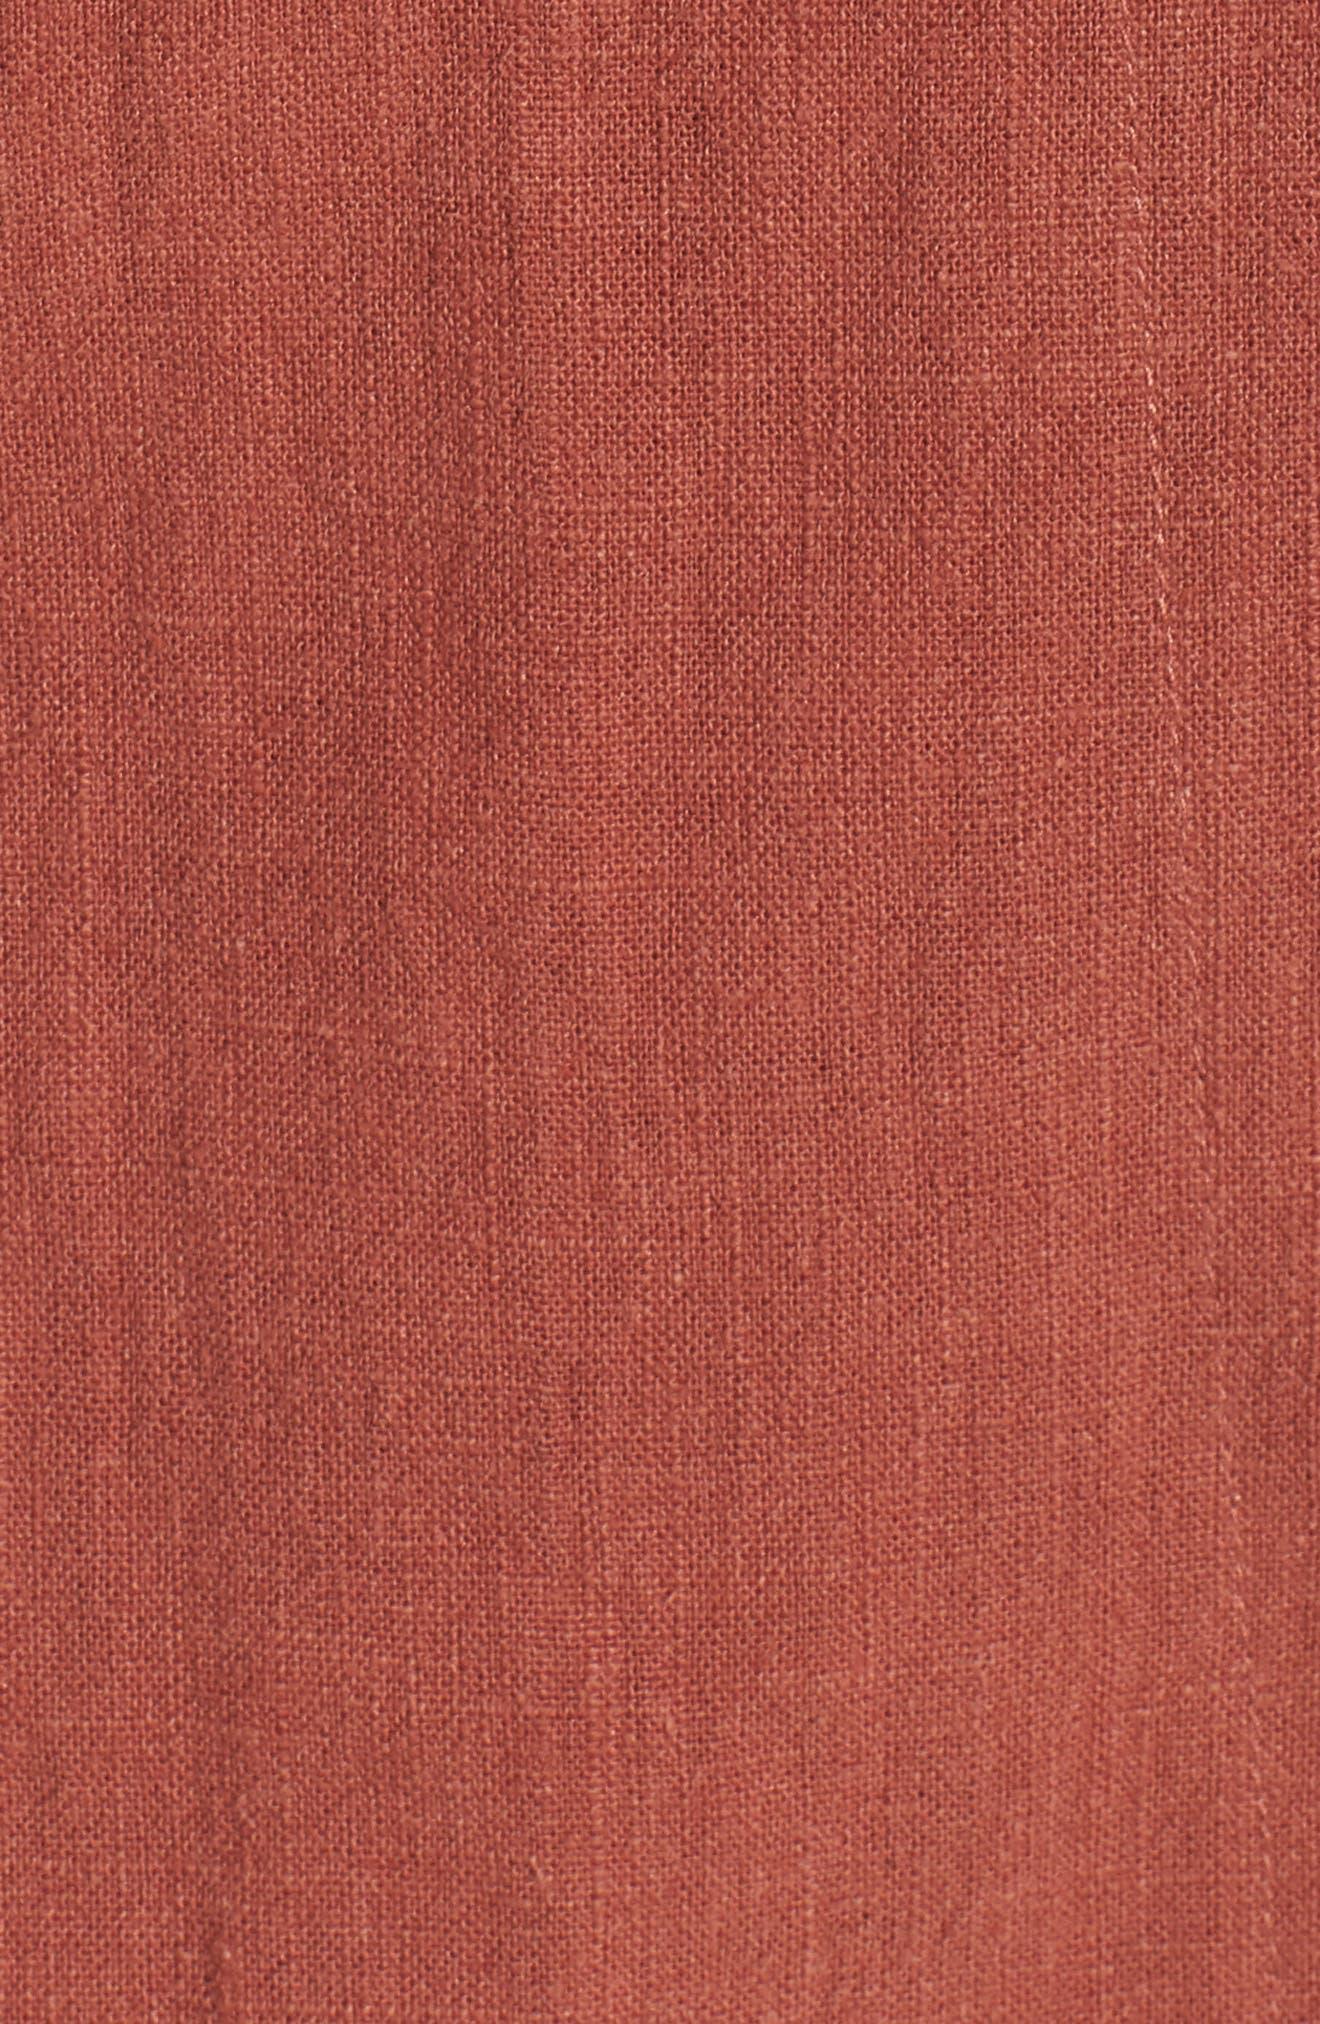 Wrap A-Line Skirt,                             Alternate thumbnail 6, color,                             Rust